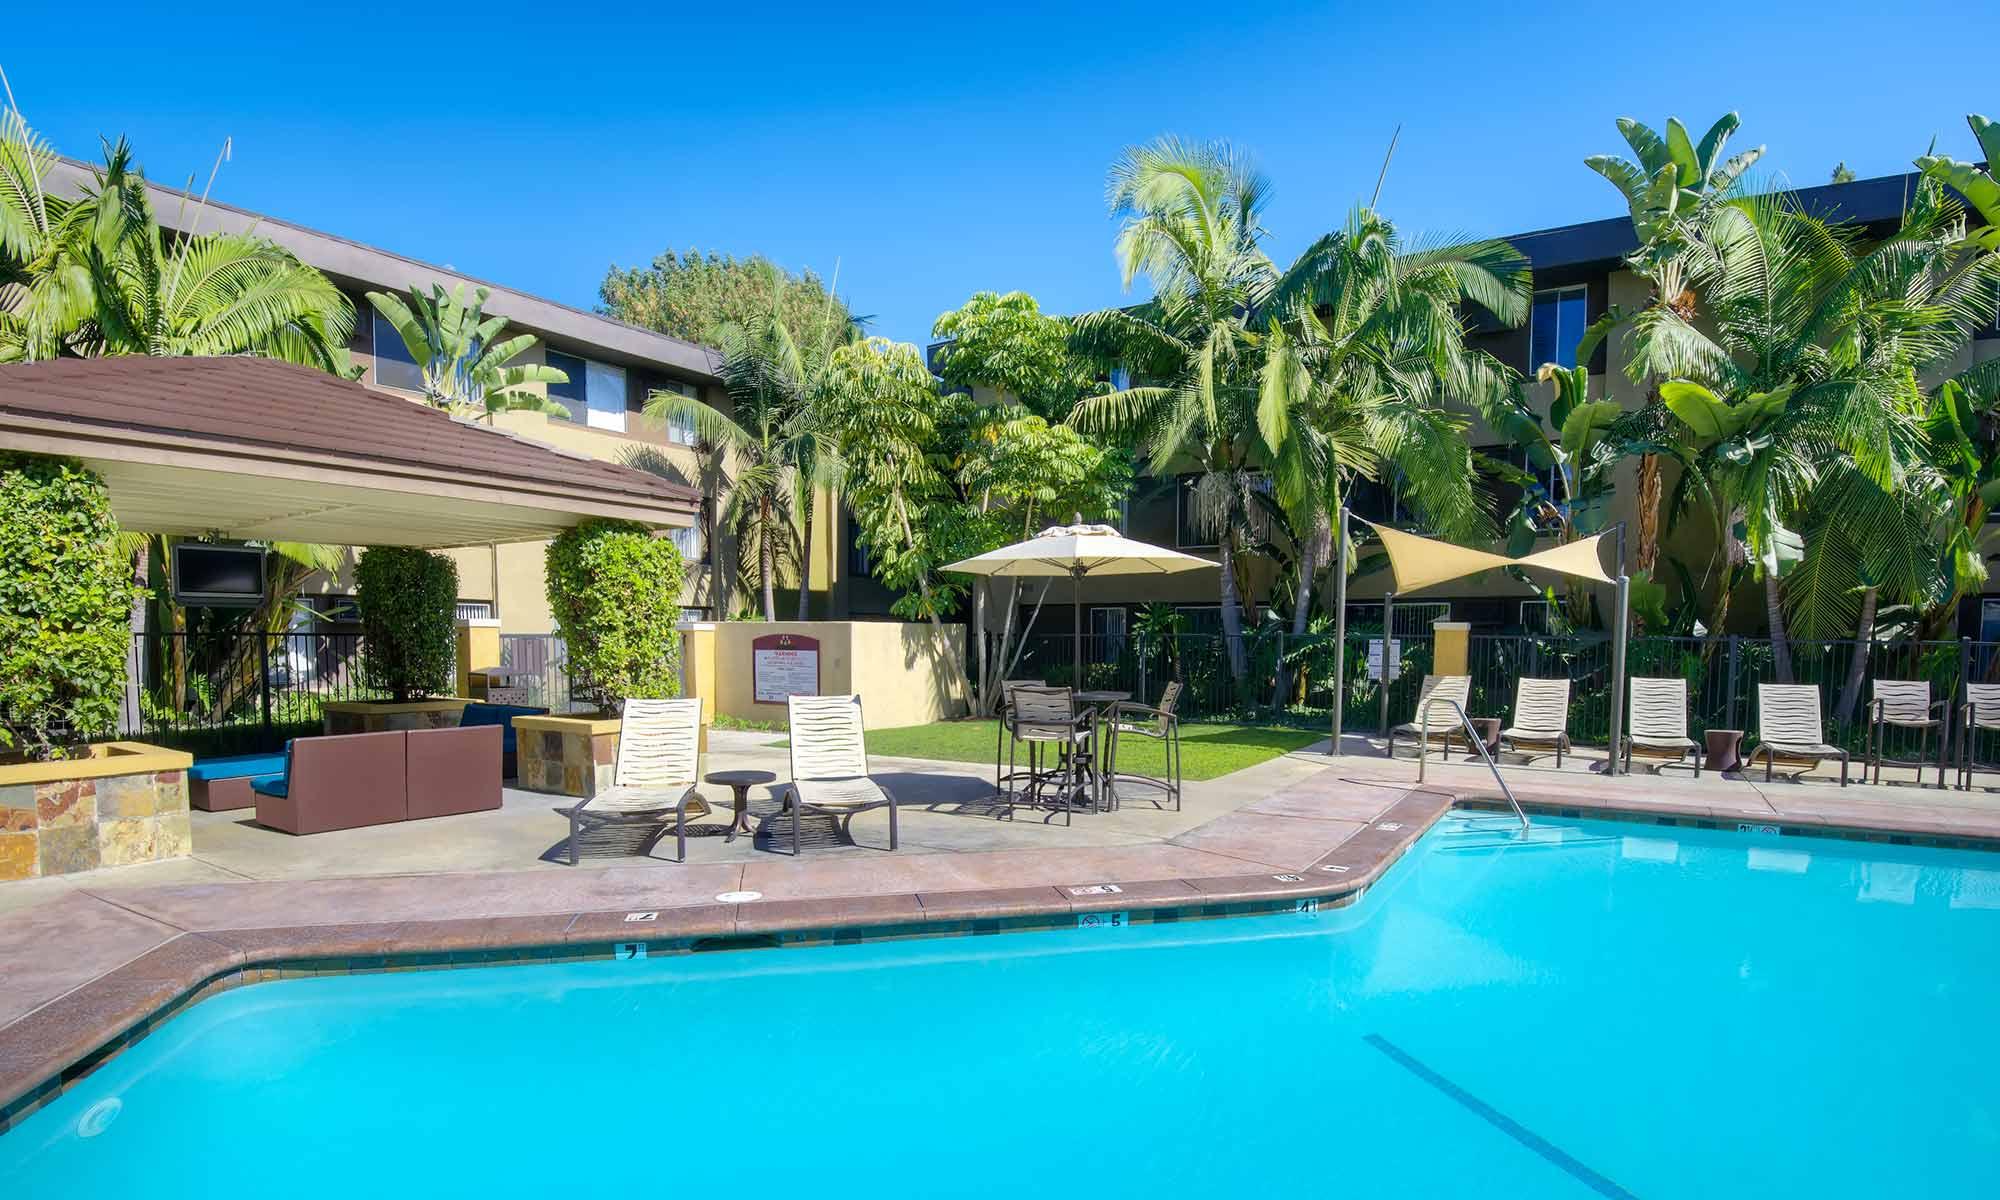 Apartments in Fullerton, CA